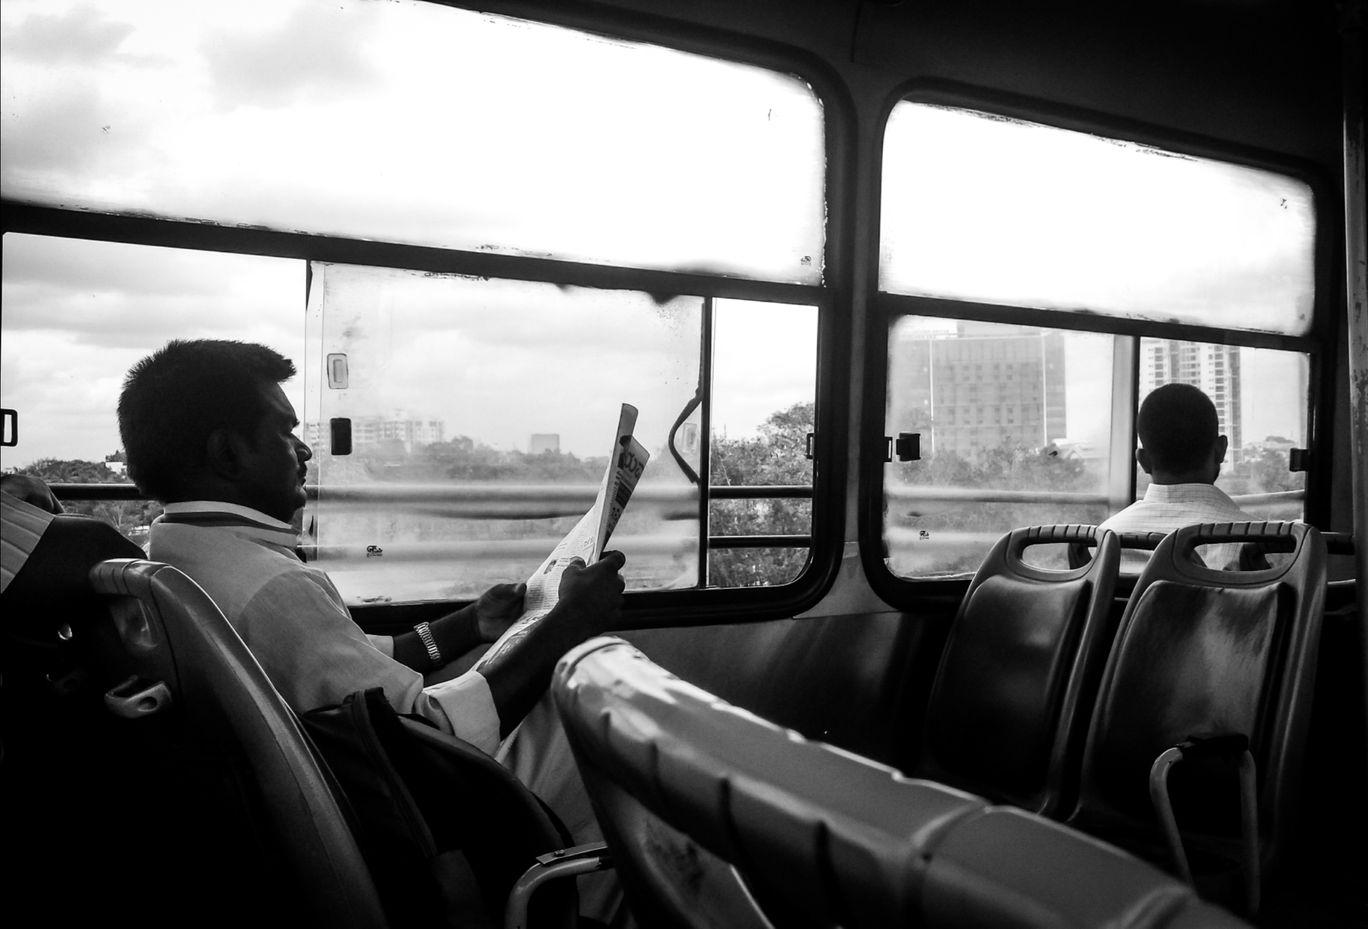 Photo of Bengaluru By Akhil Thomas Varghese